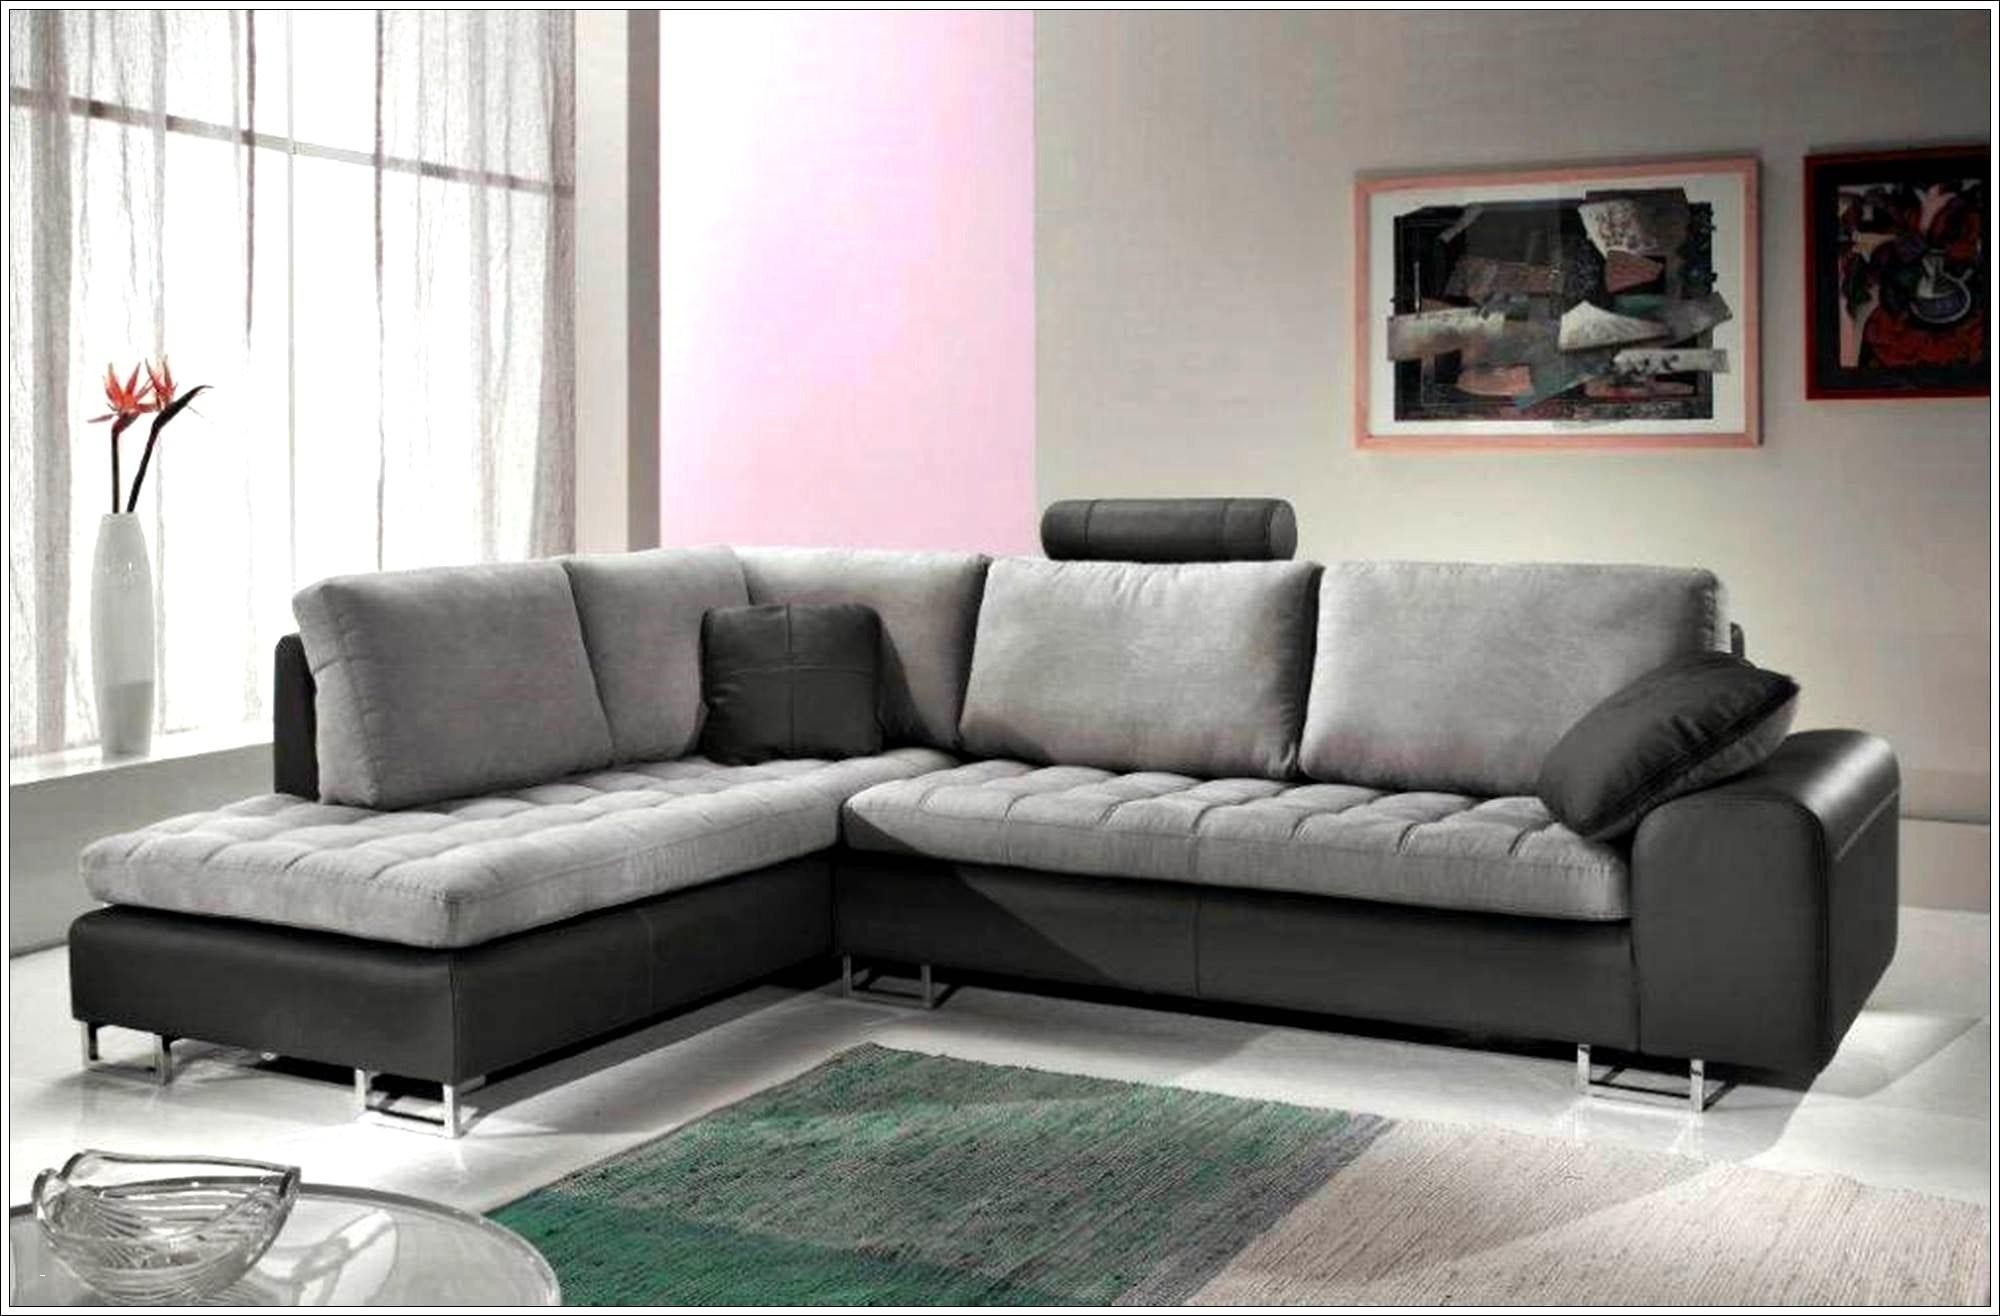 Canapé Cuir Convertible Conforama Inspirant Images 27 Superbe Canapé Convertible Design Design De Maison